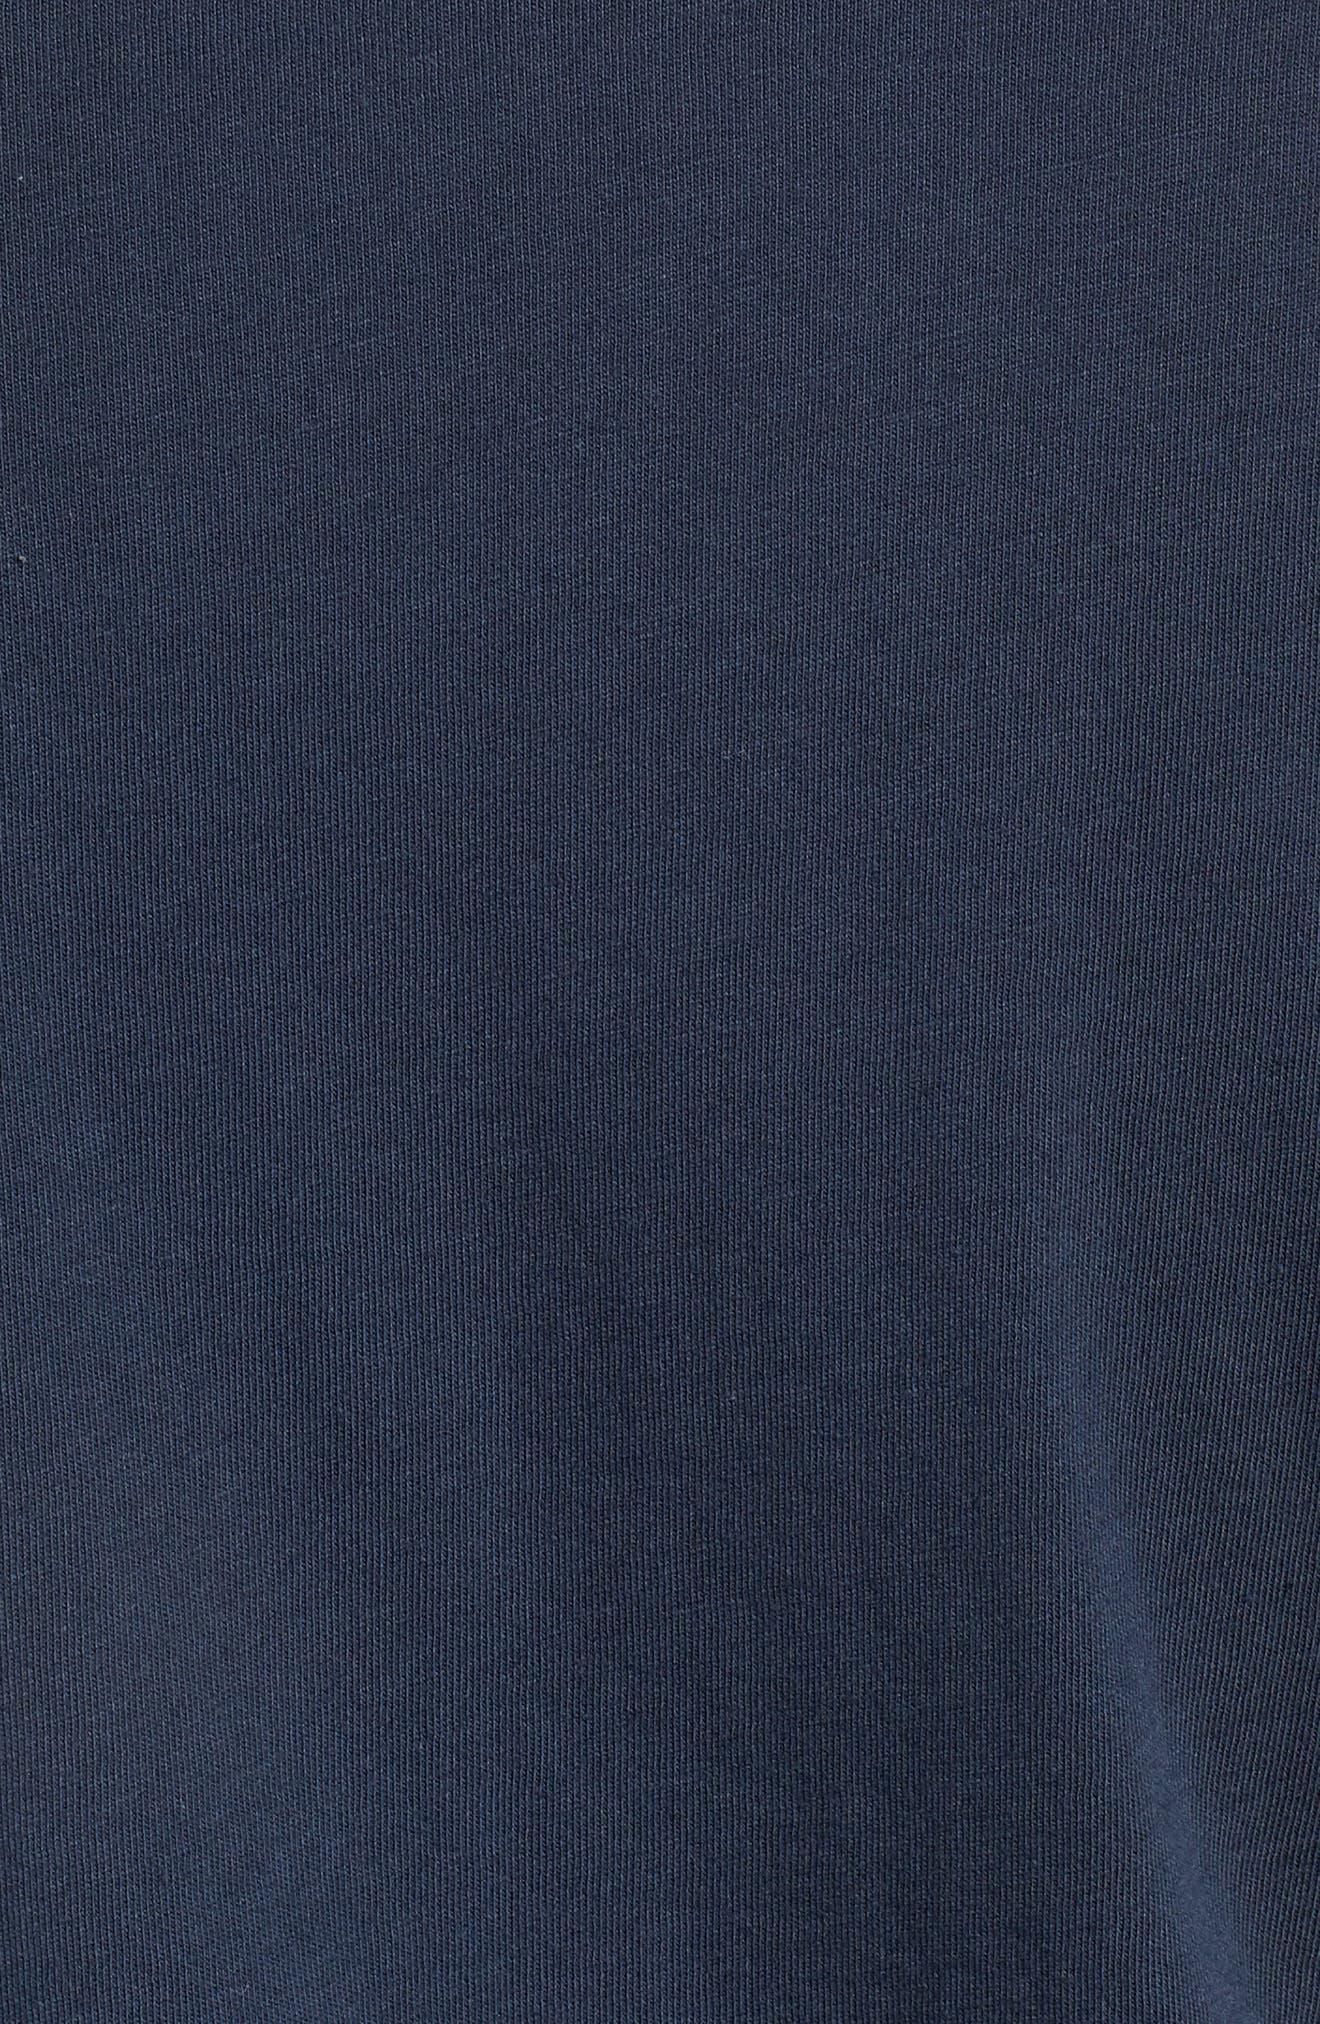 Access Graphic T-Shirt,                             Alternate thumbnail 5, color,                             Navy